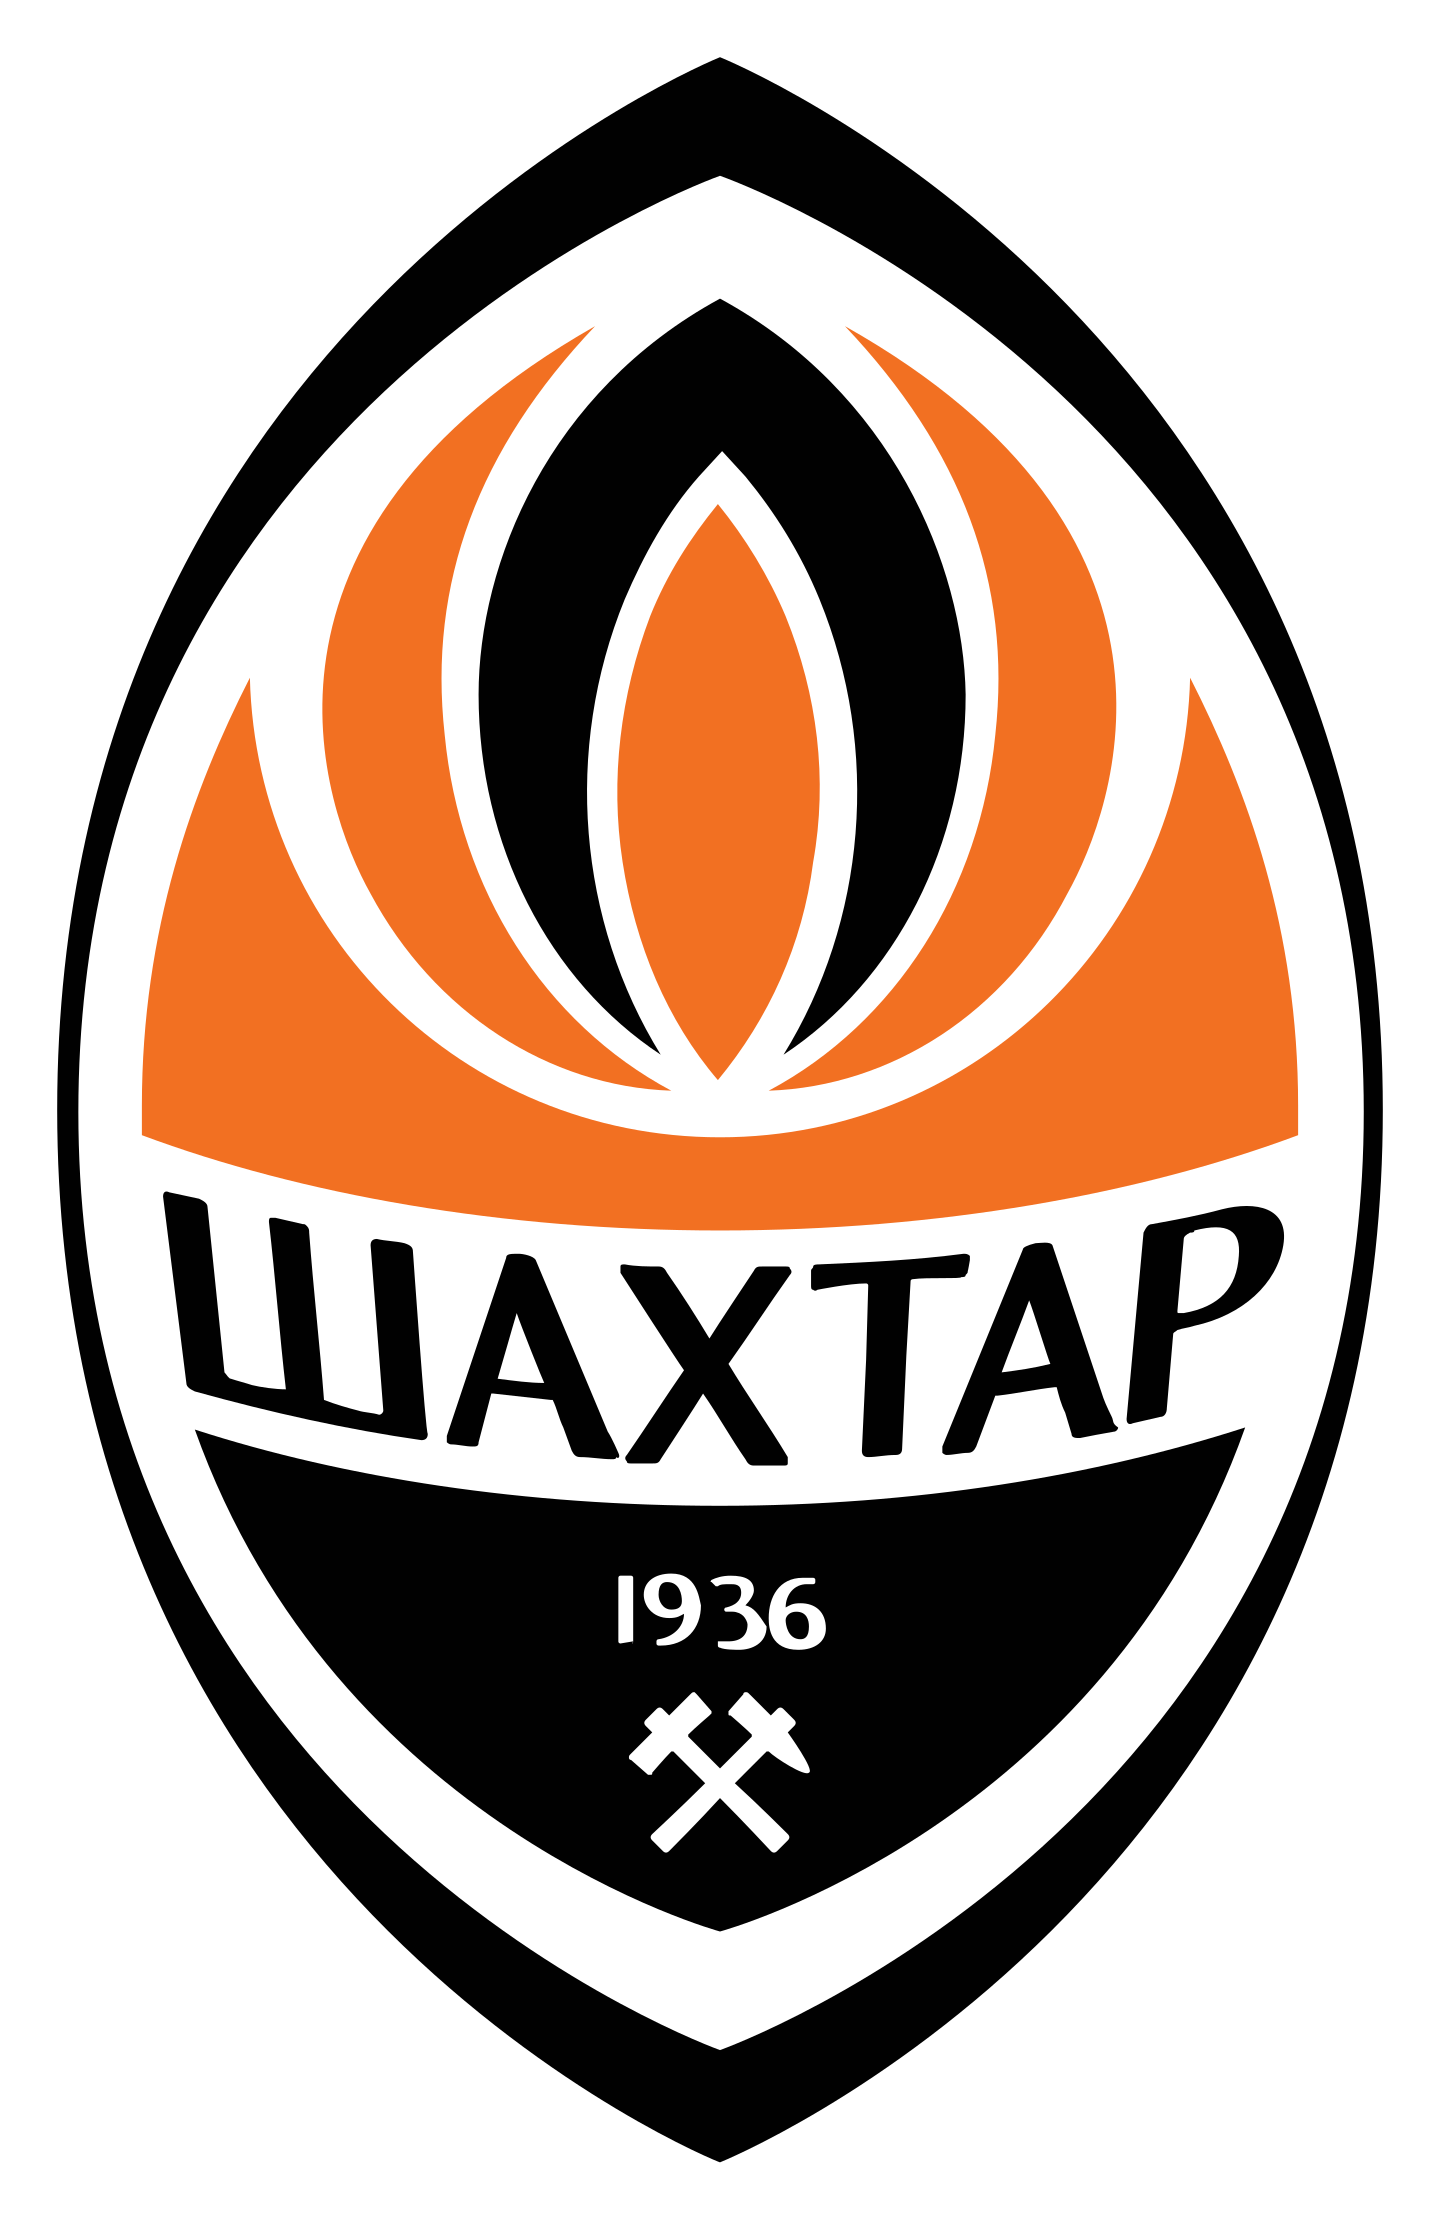 shakhtar logo 2 - FK Shakhtar Logo - Escudo